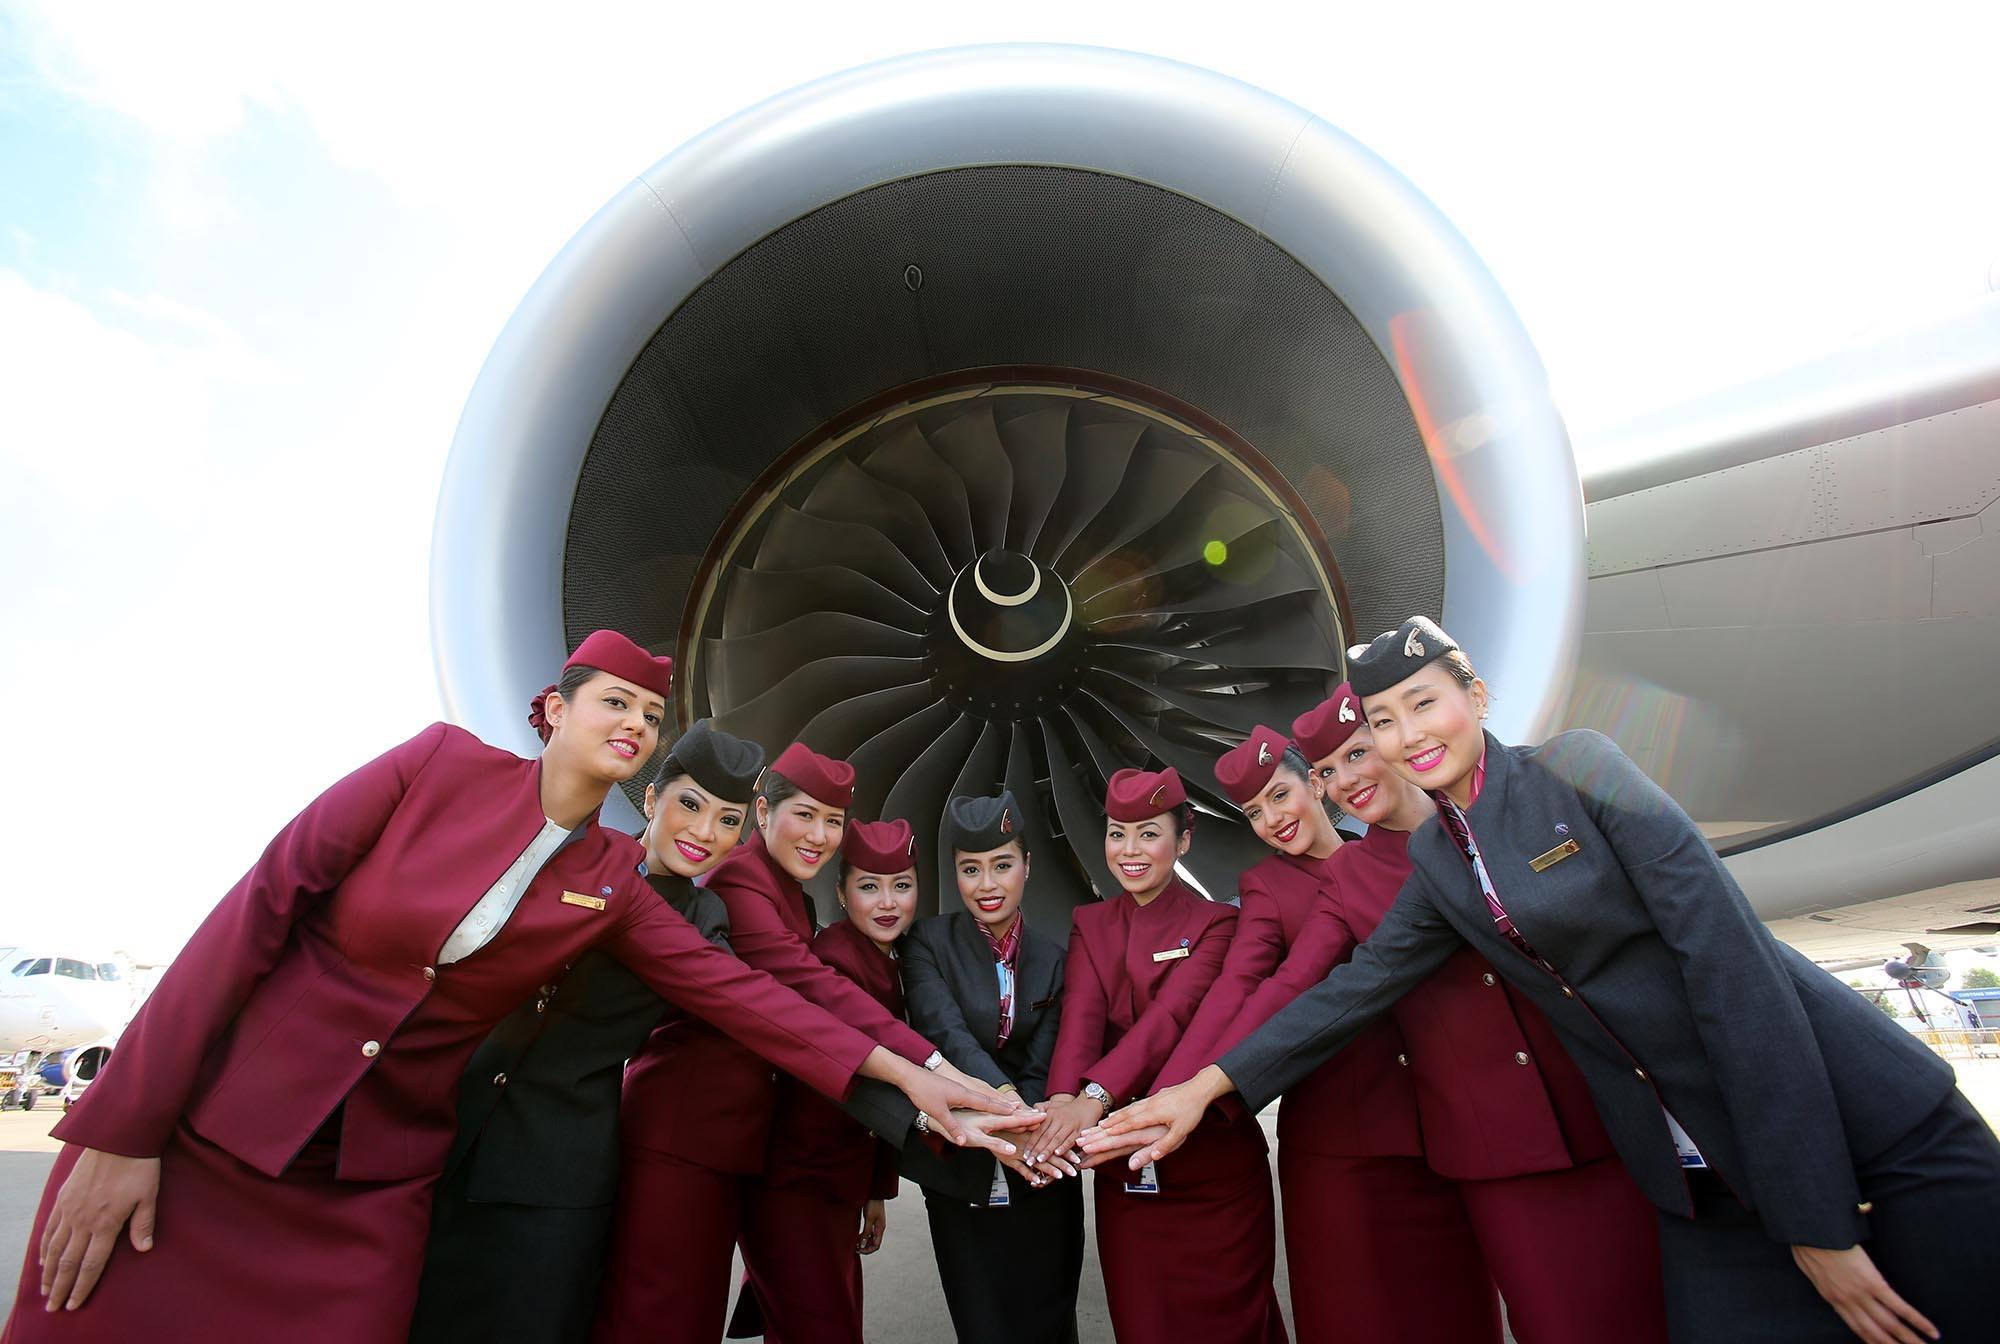 Qatar Airways Cabin Crew Recruitment - (London) [2020] - Apply Now